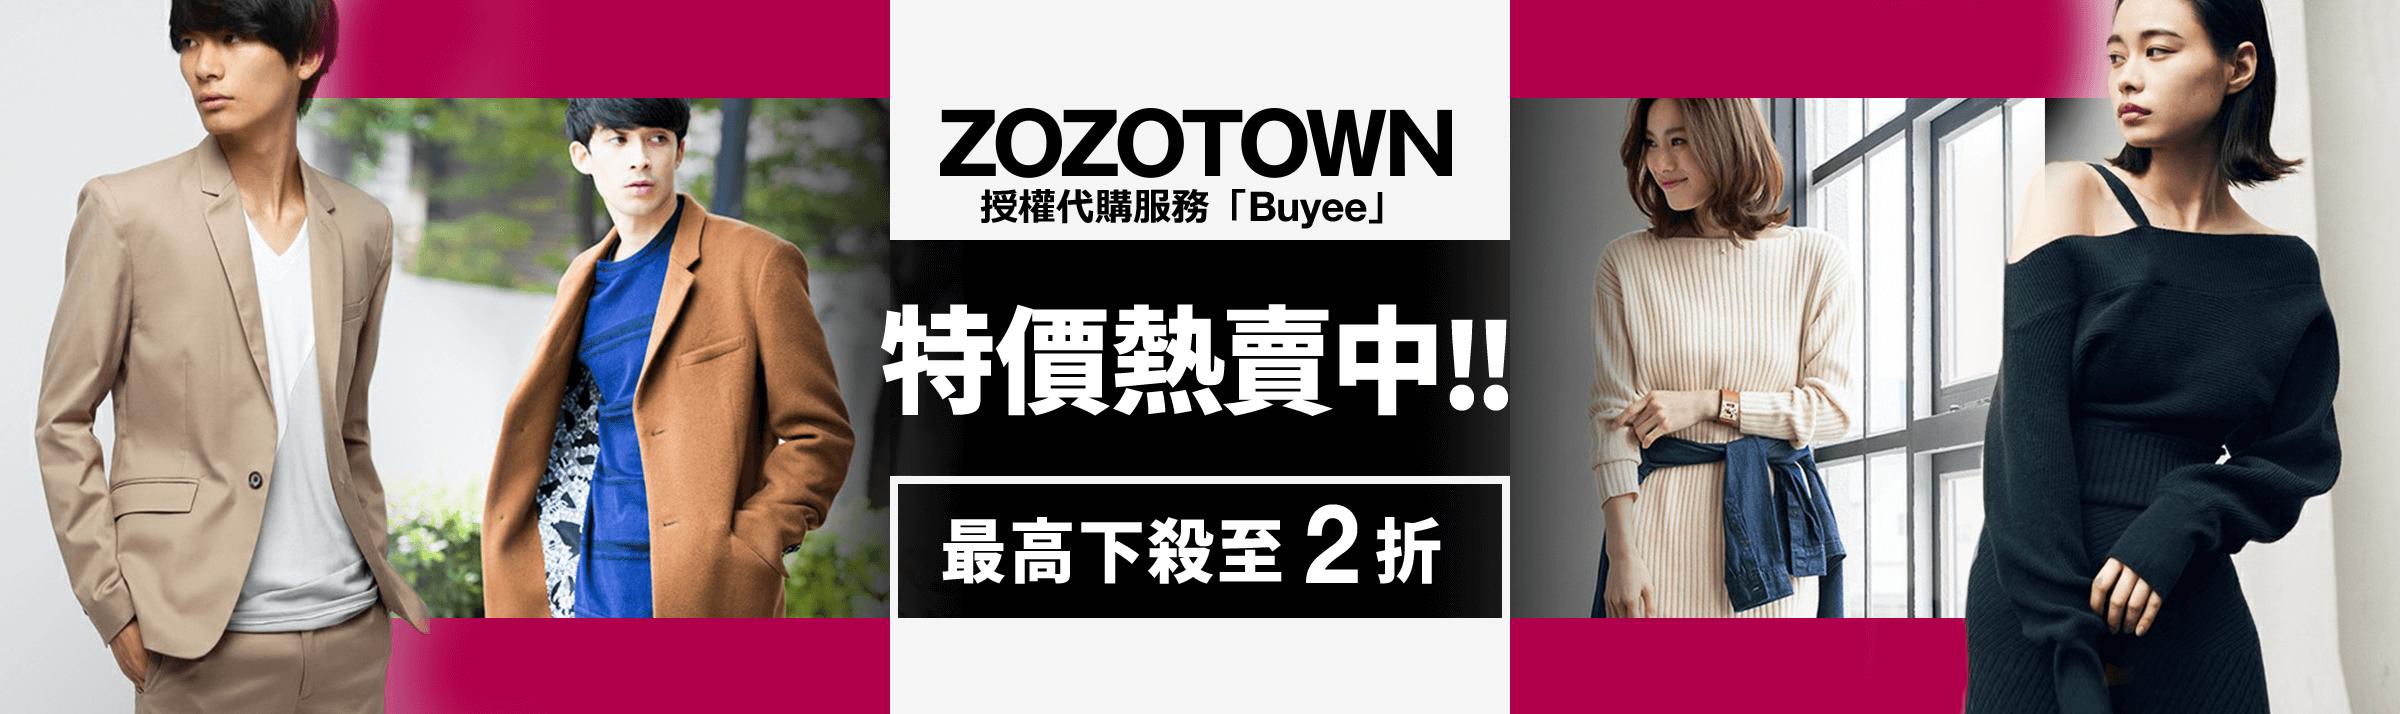 ZOZOTOWN 大特價SALE熱賣中!